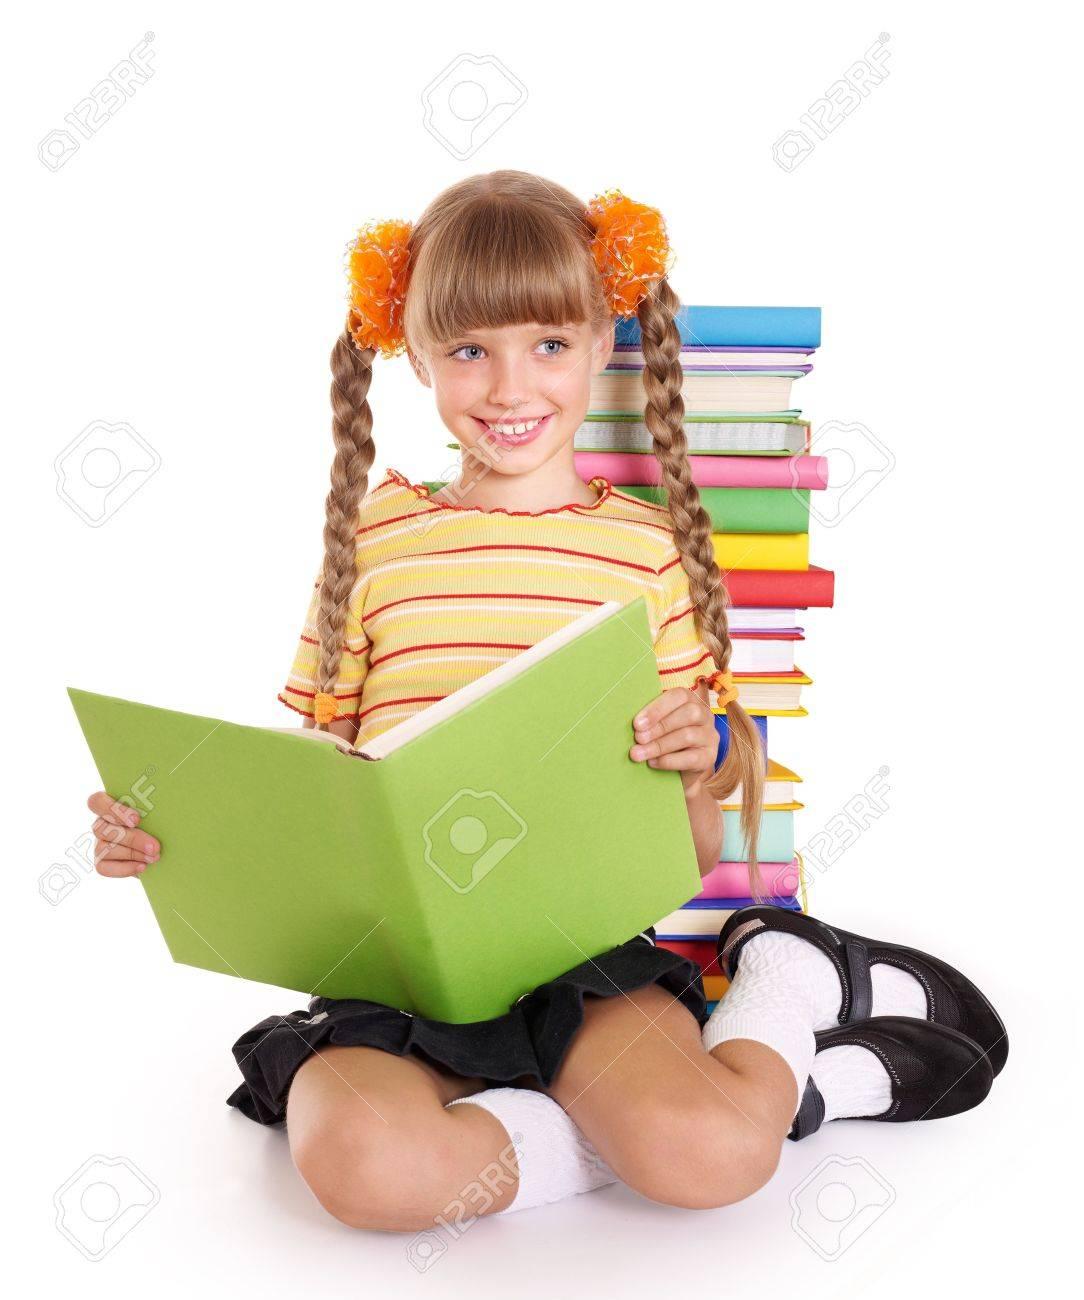 Little girl reading pile of books. Isolated. Stock Photo - 7631283